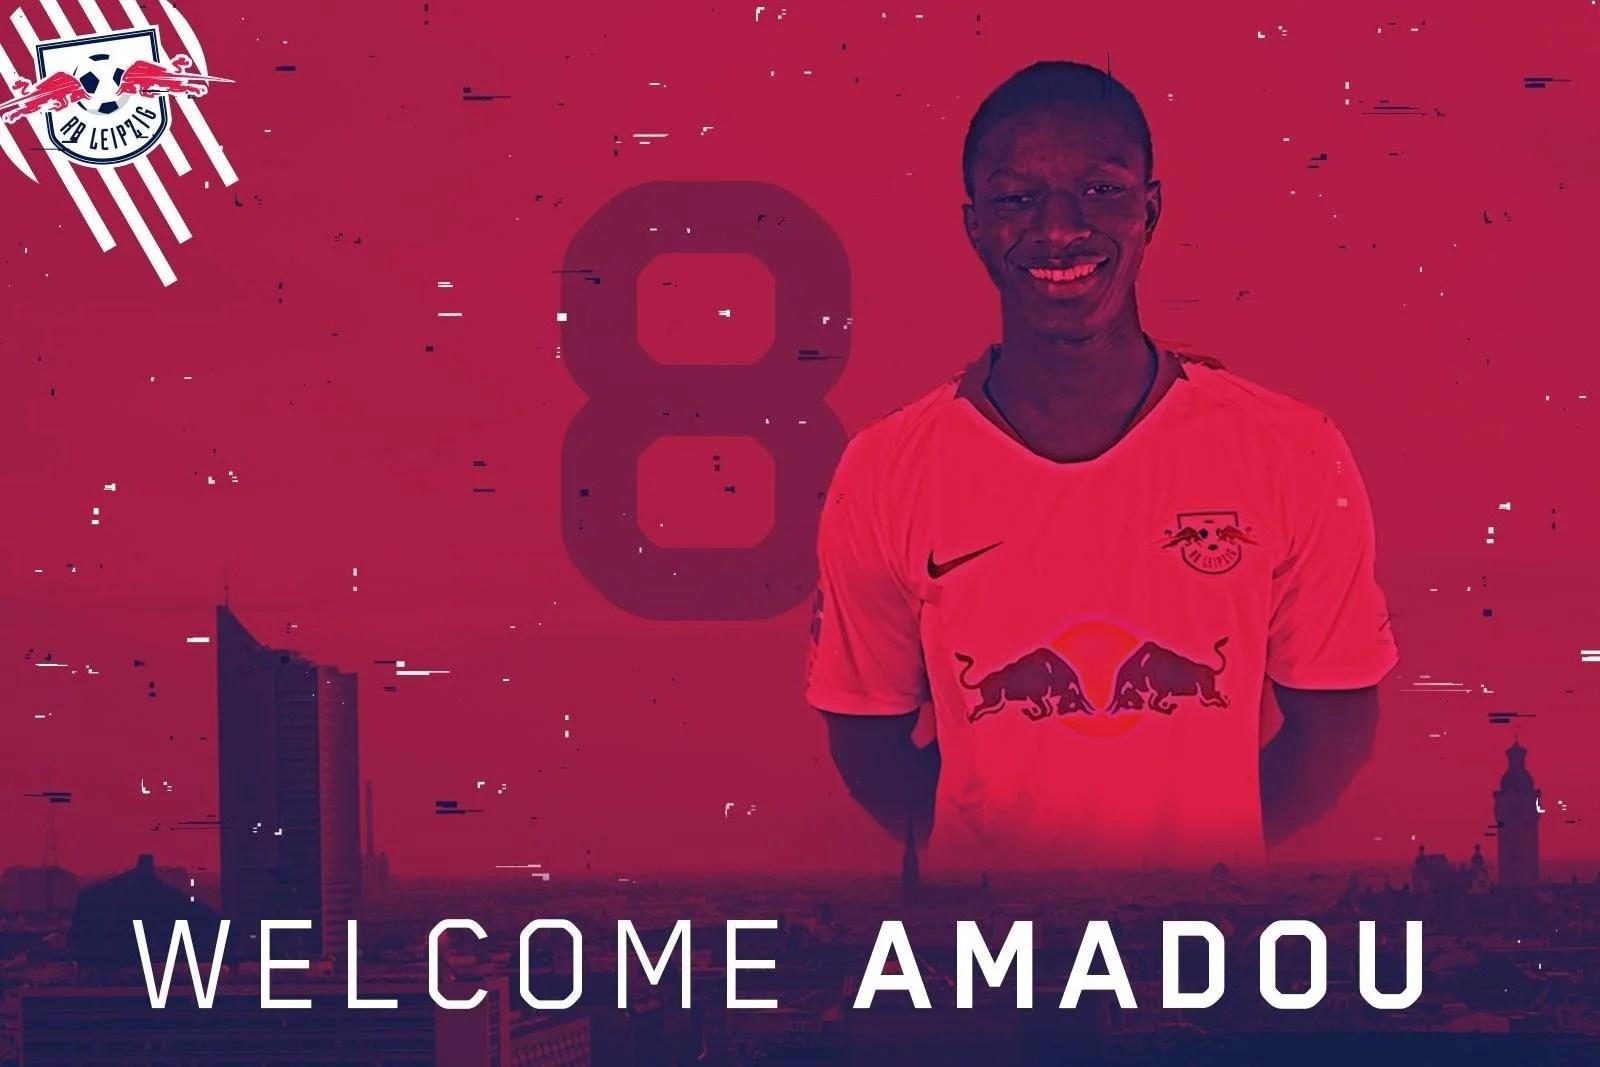 amadou haidara-jmg football management RB LEipzig